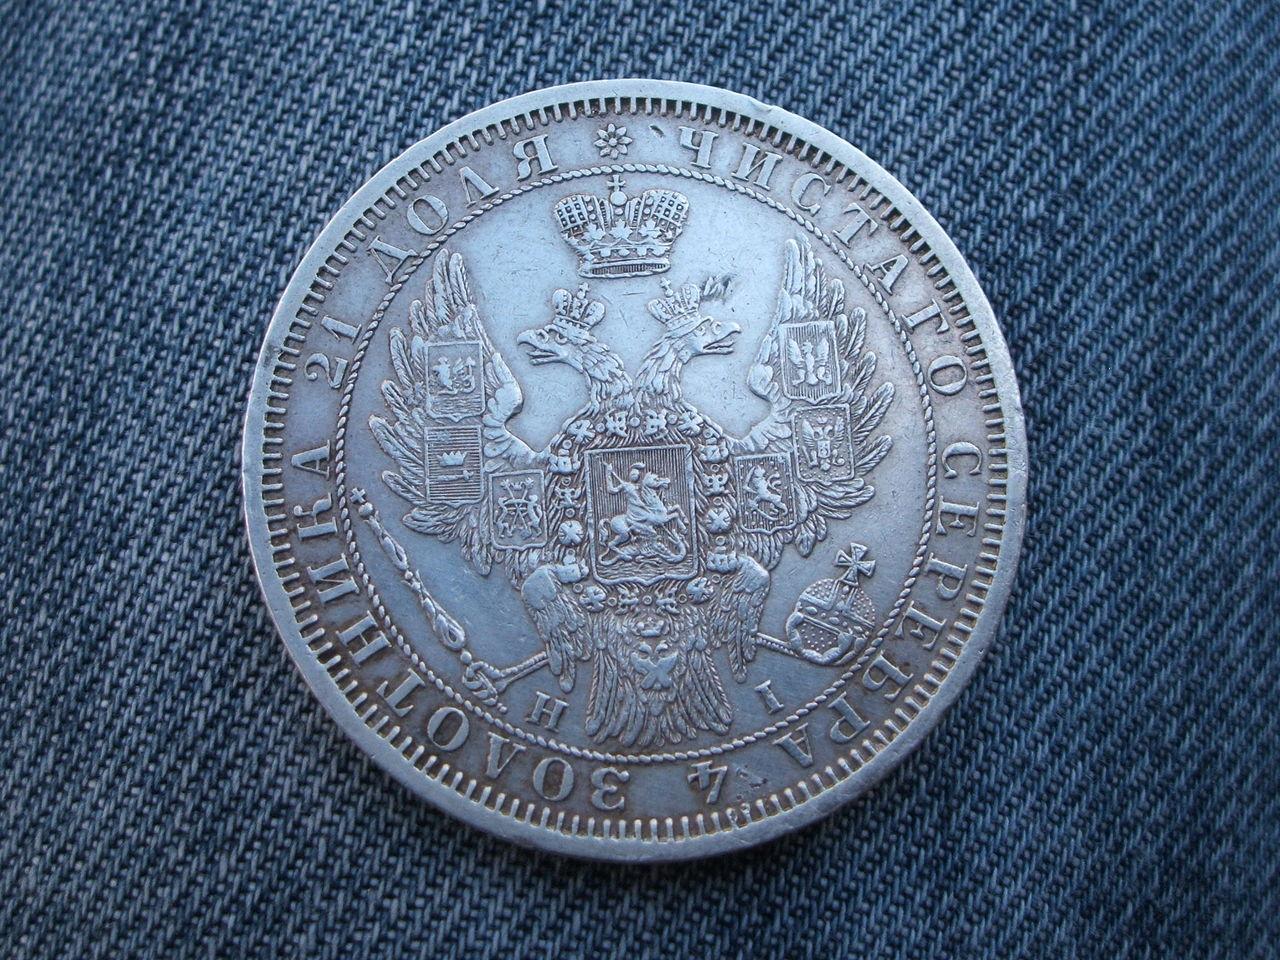 1 Rublo. Rusia. 1855. San Petersburgo 009